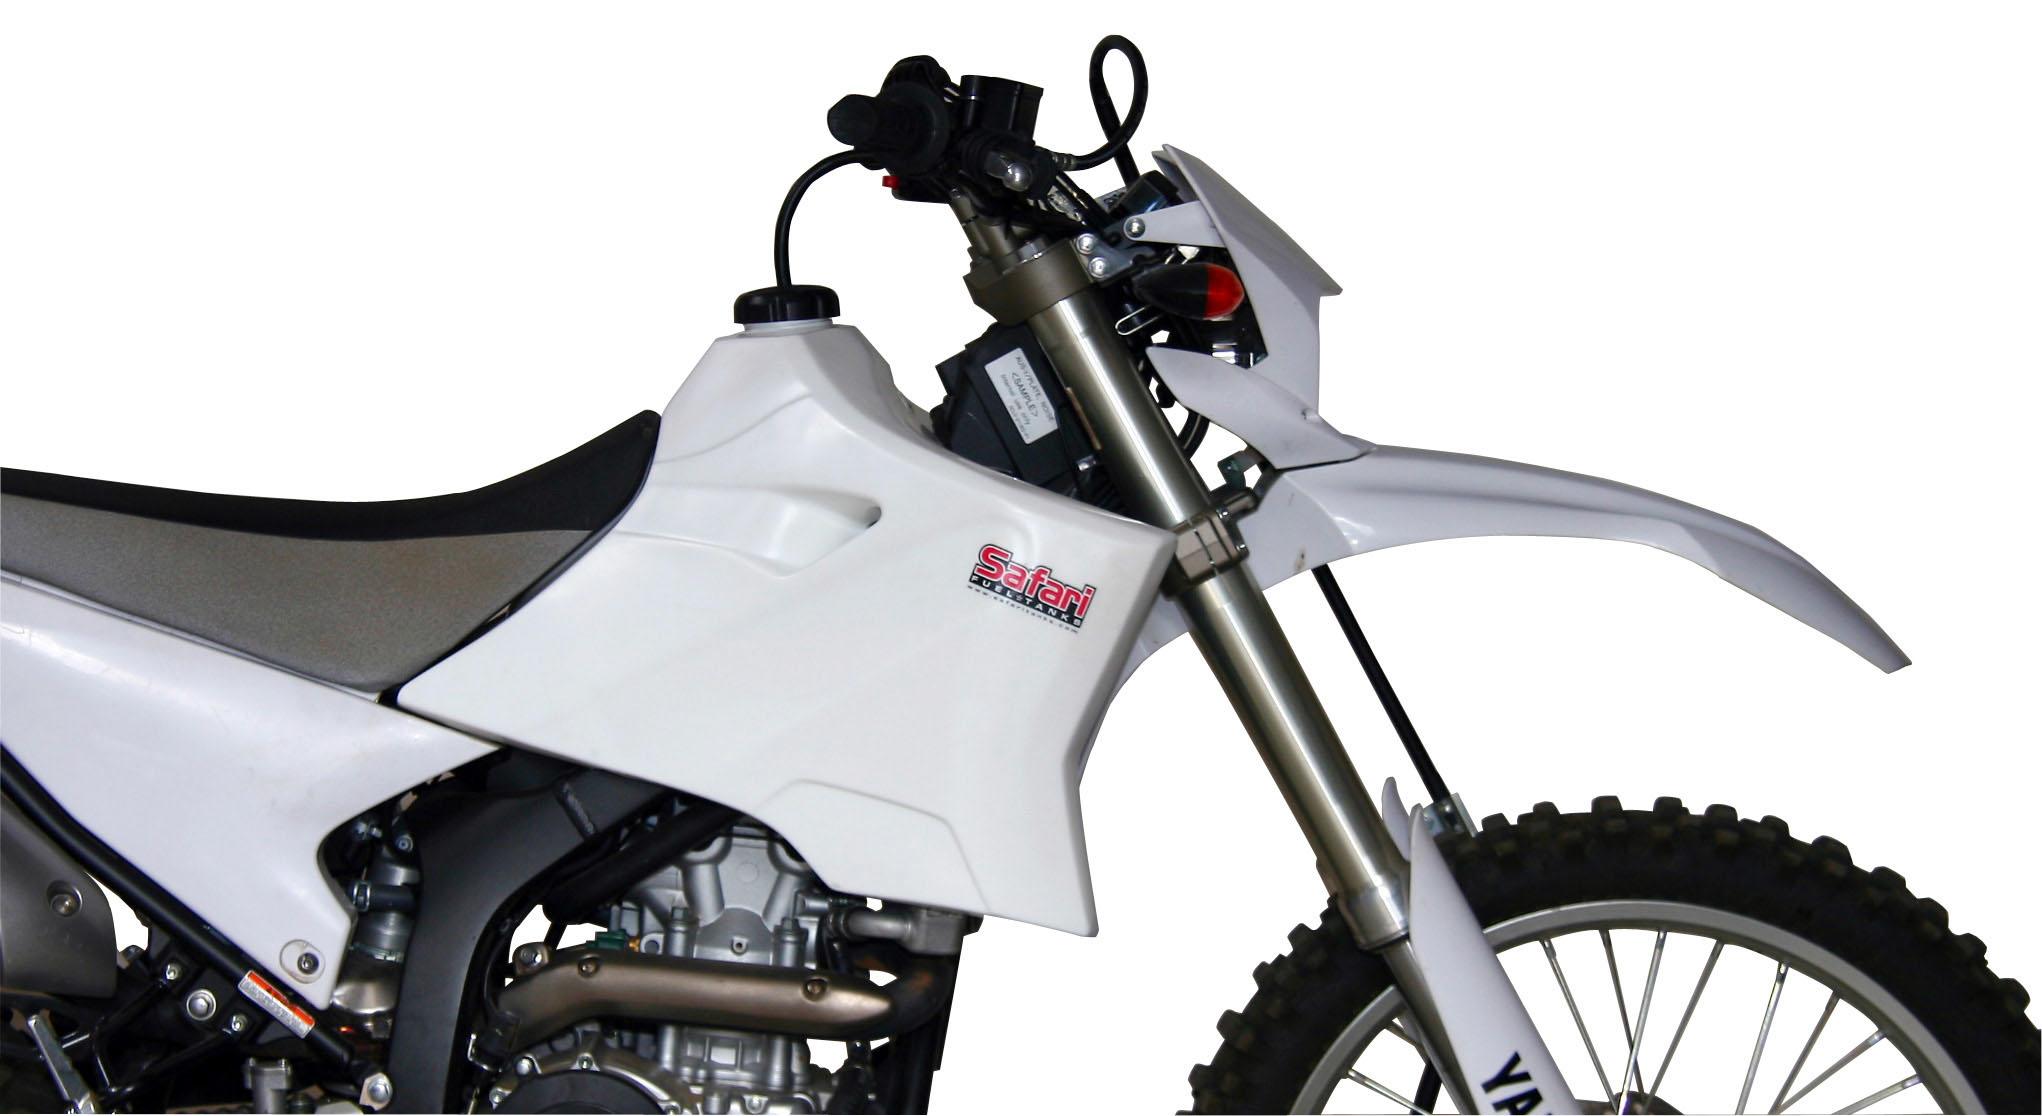 Lc8 Ktm Motorcycle Engine Diagrams Wiring Diagram 50 Raid Designs Ab Yamaha Wr250r 14 Litre 950 Vs 990 Adventure